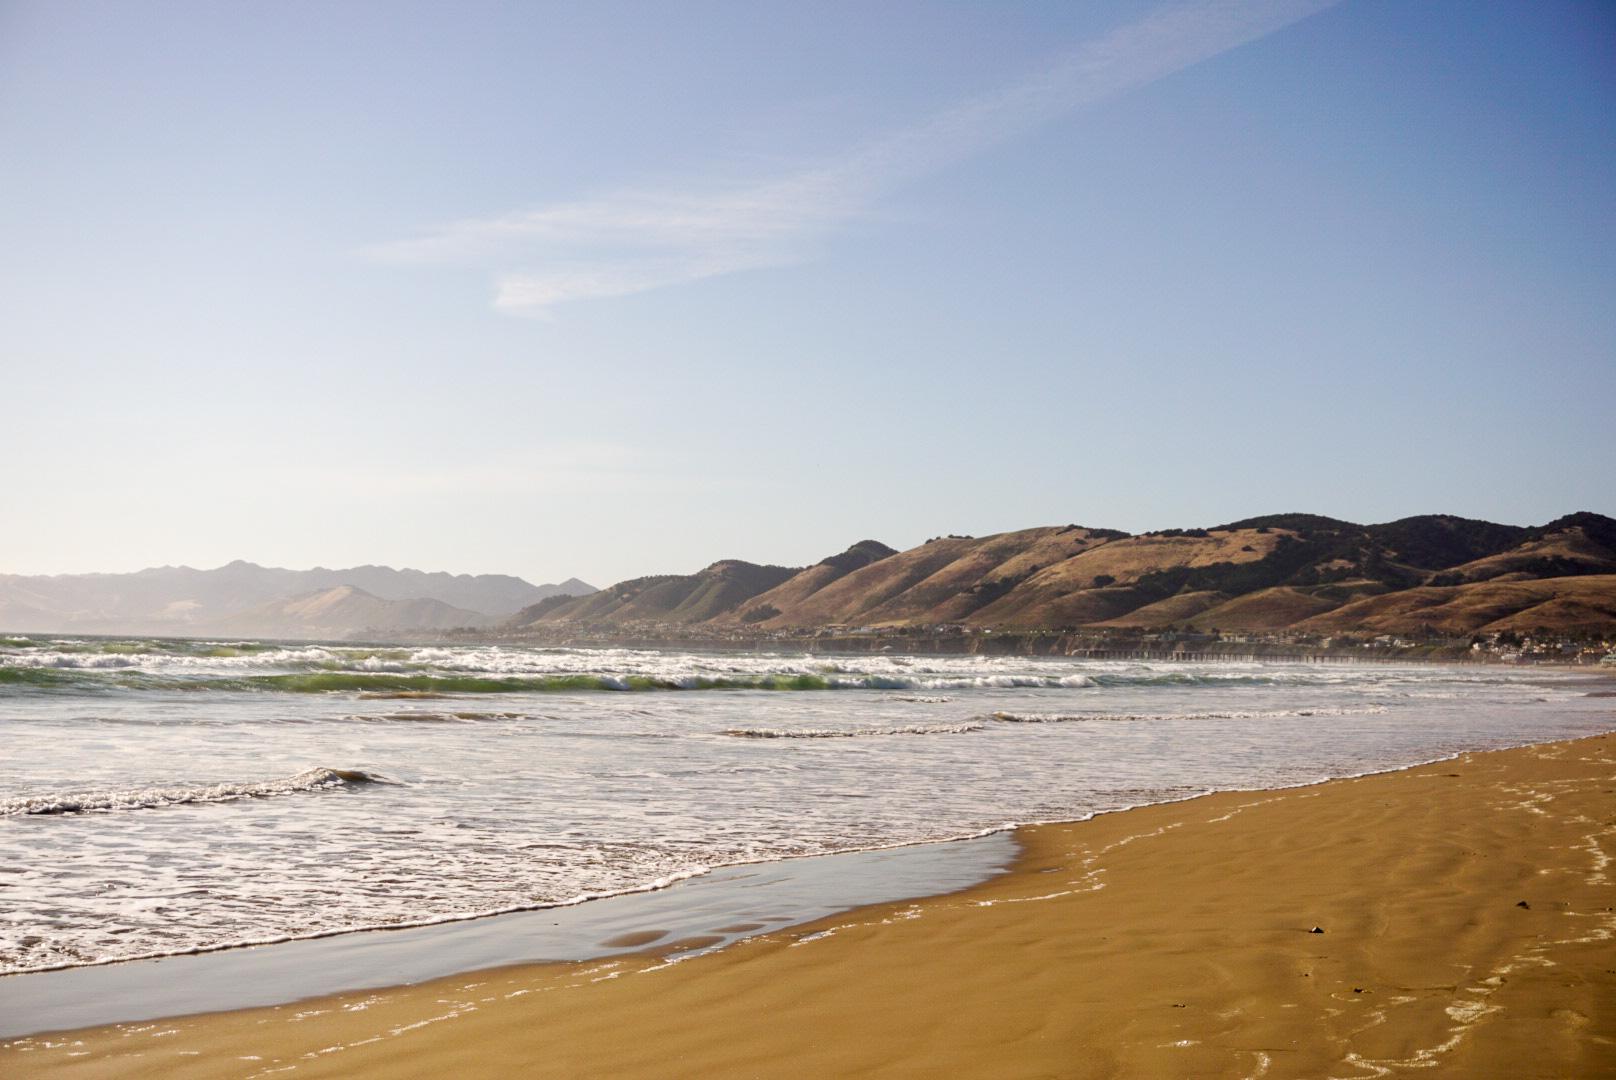 Pismo beach and mountains.jpg